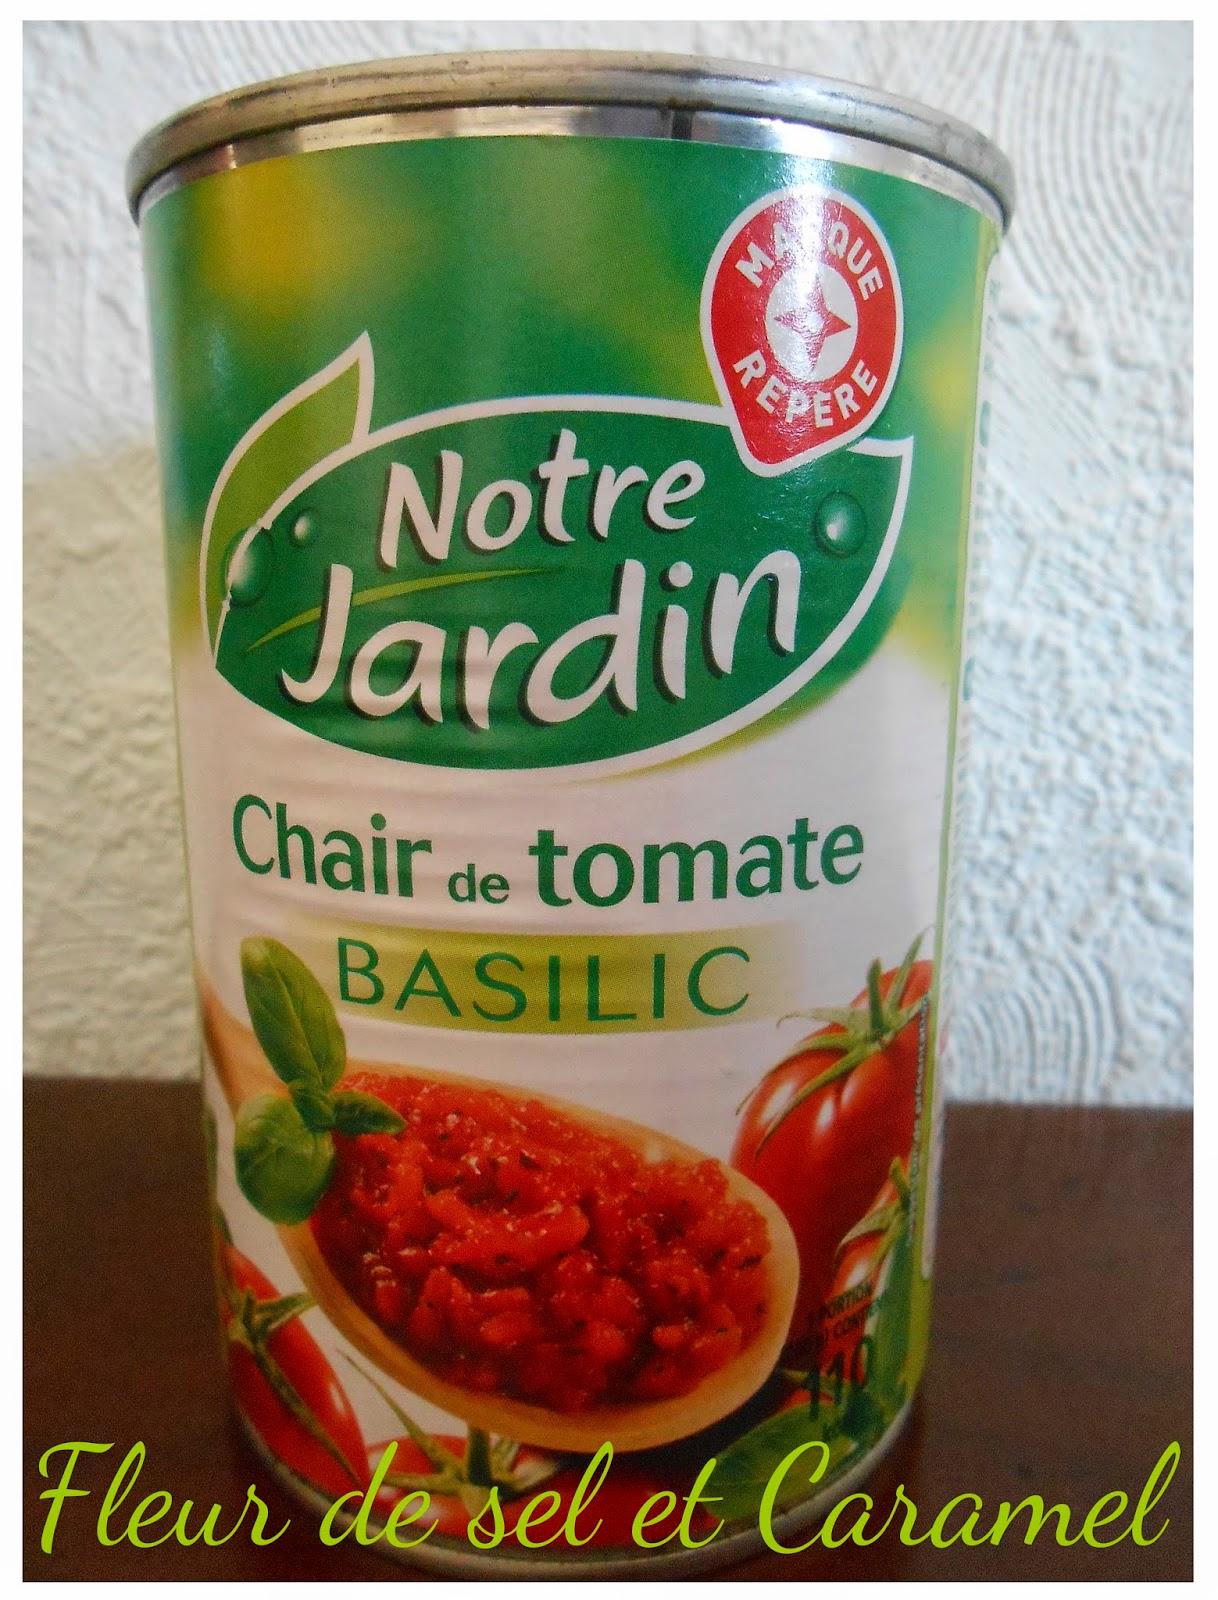 Chair de tomate au basilic